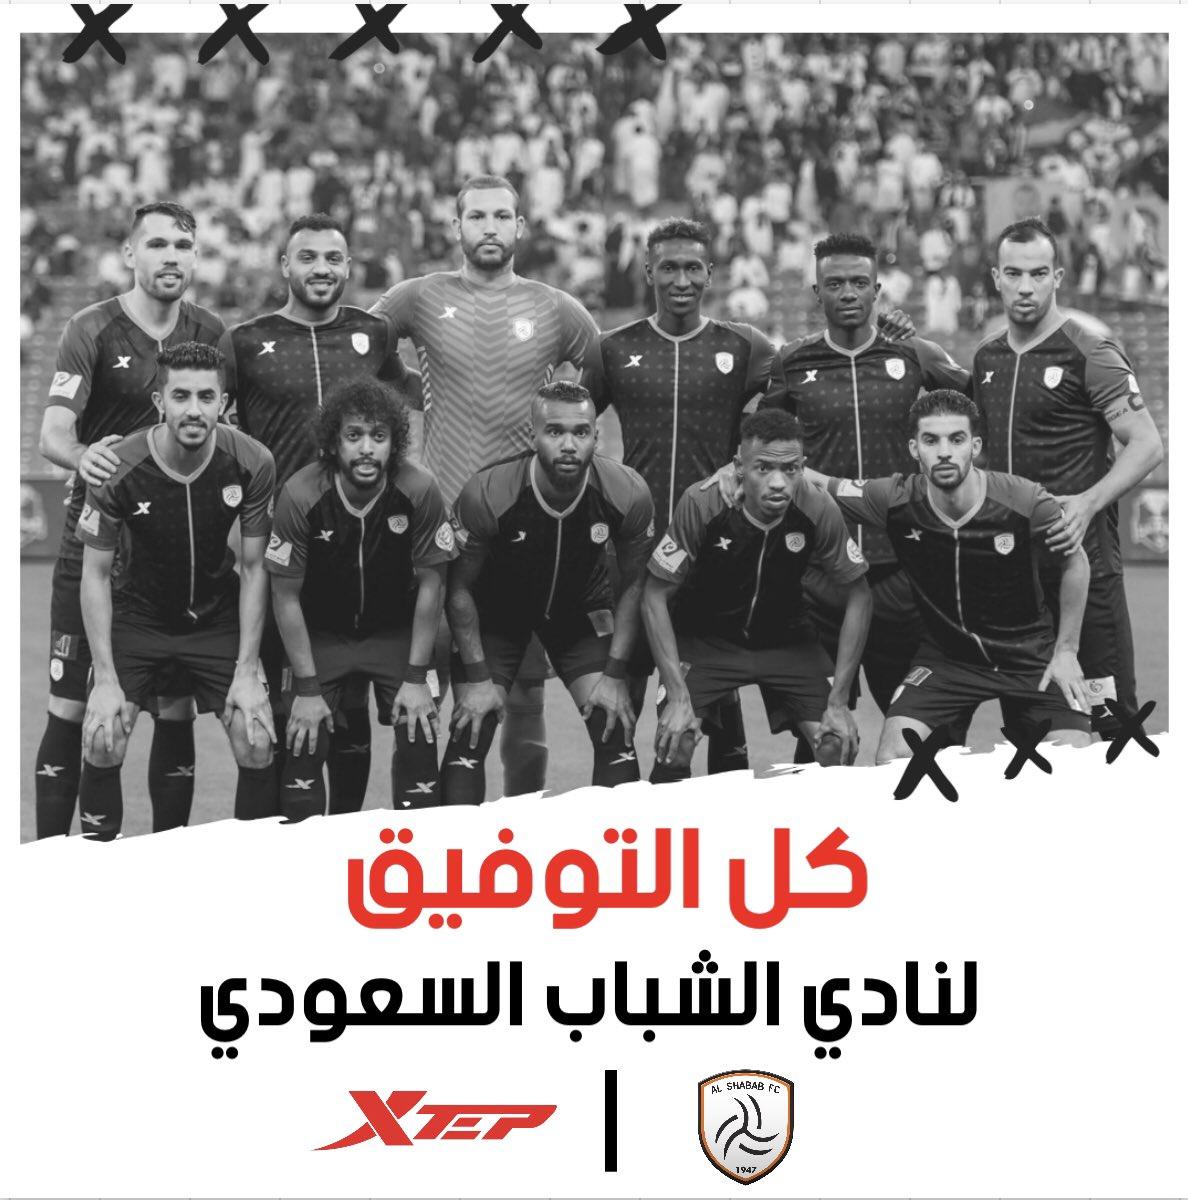 xtep اكس تيب السعودية's photo on #الاتفاق_الشباب